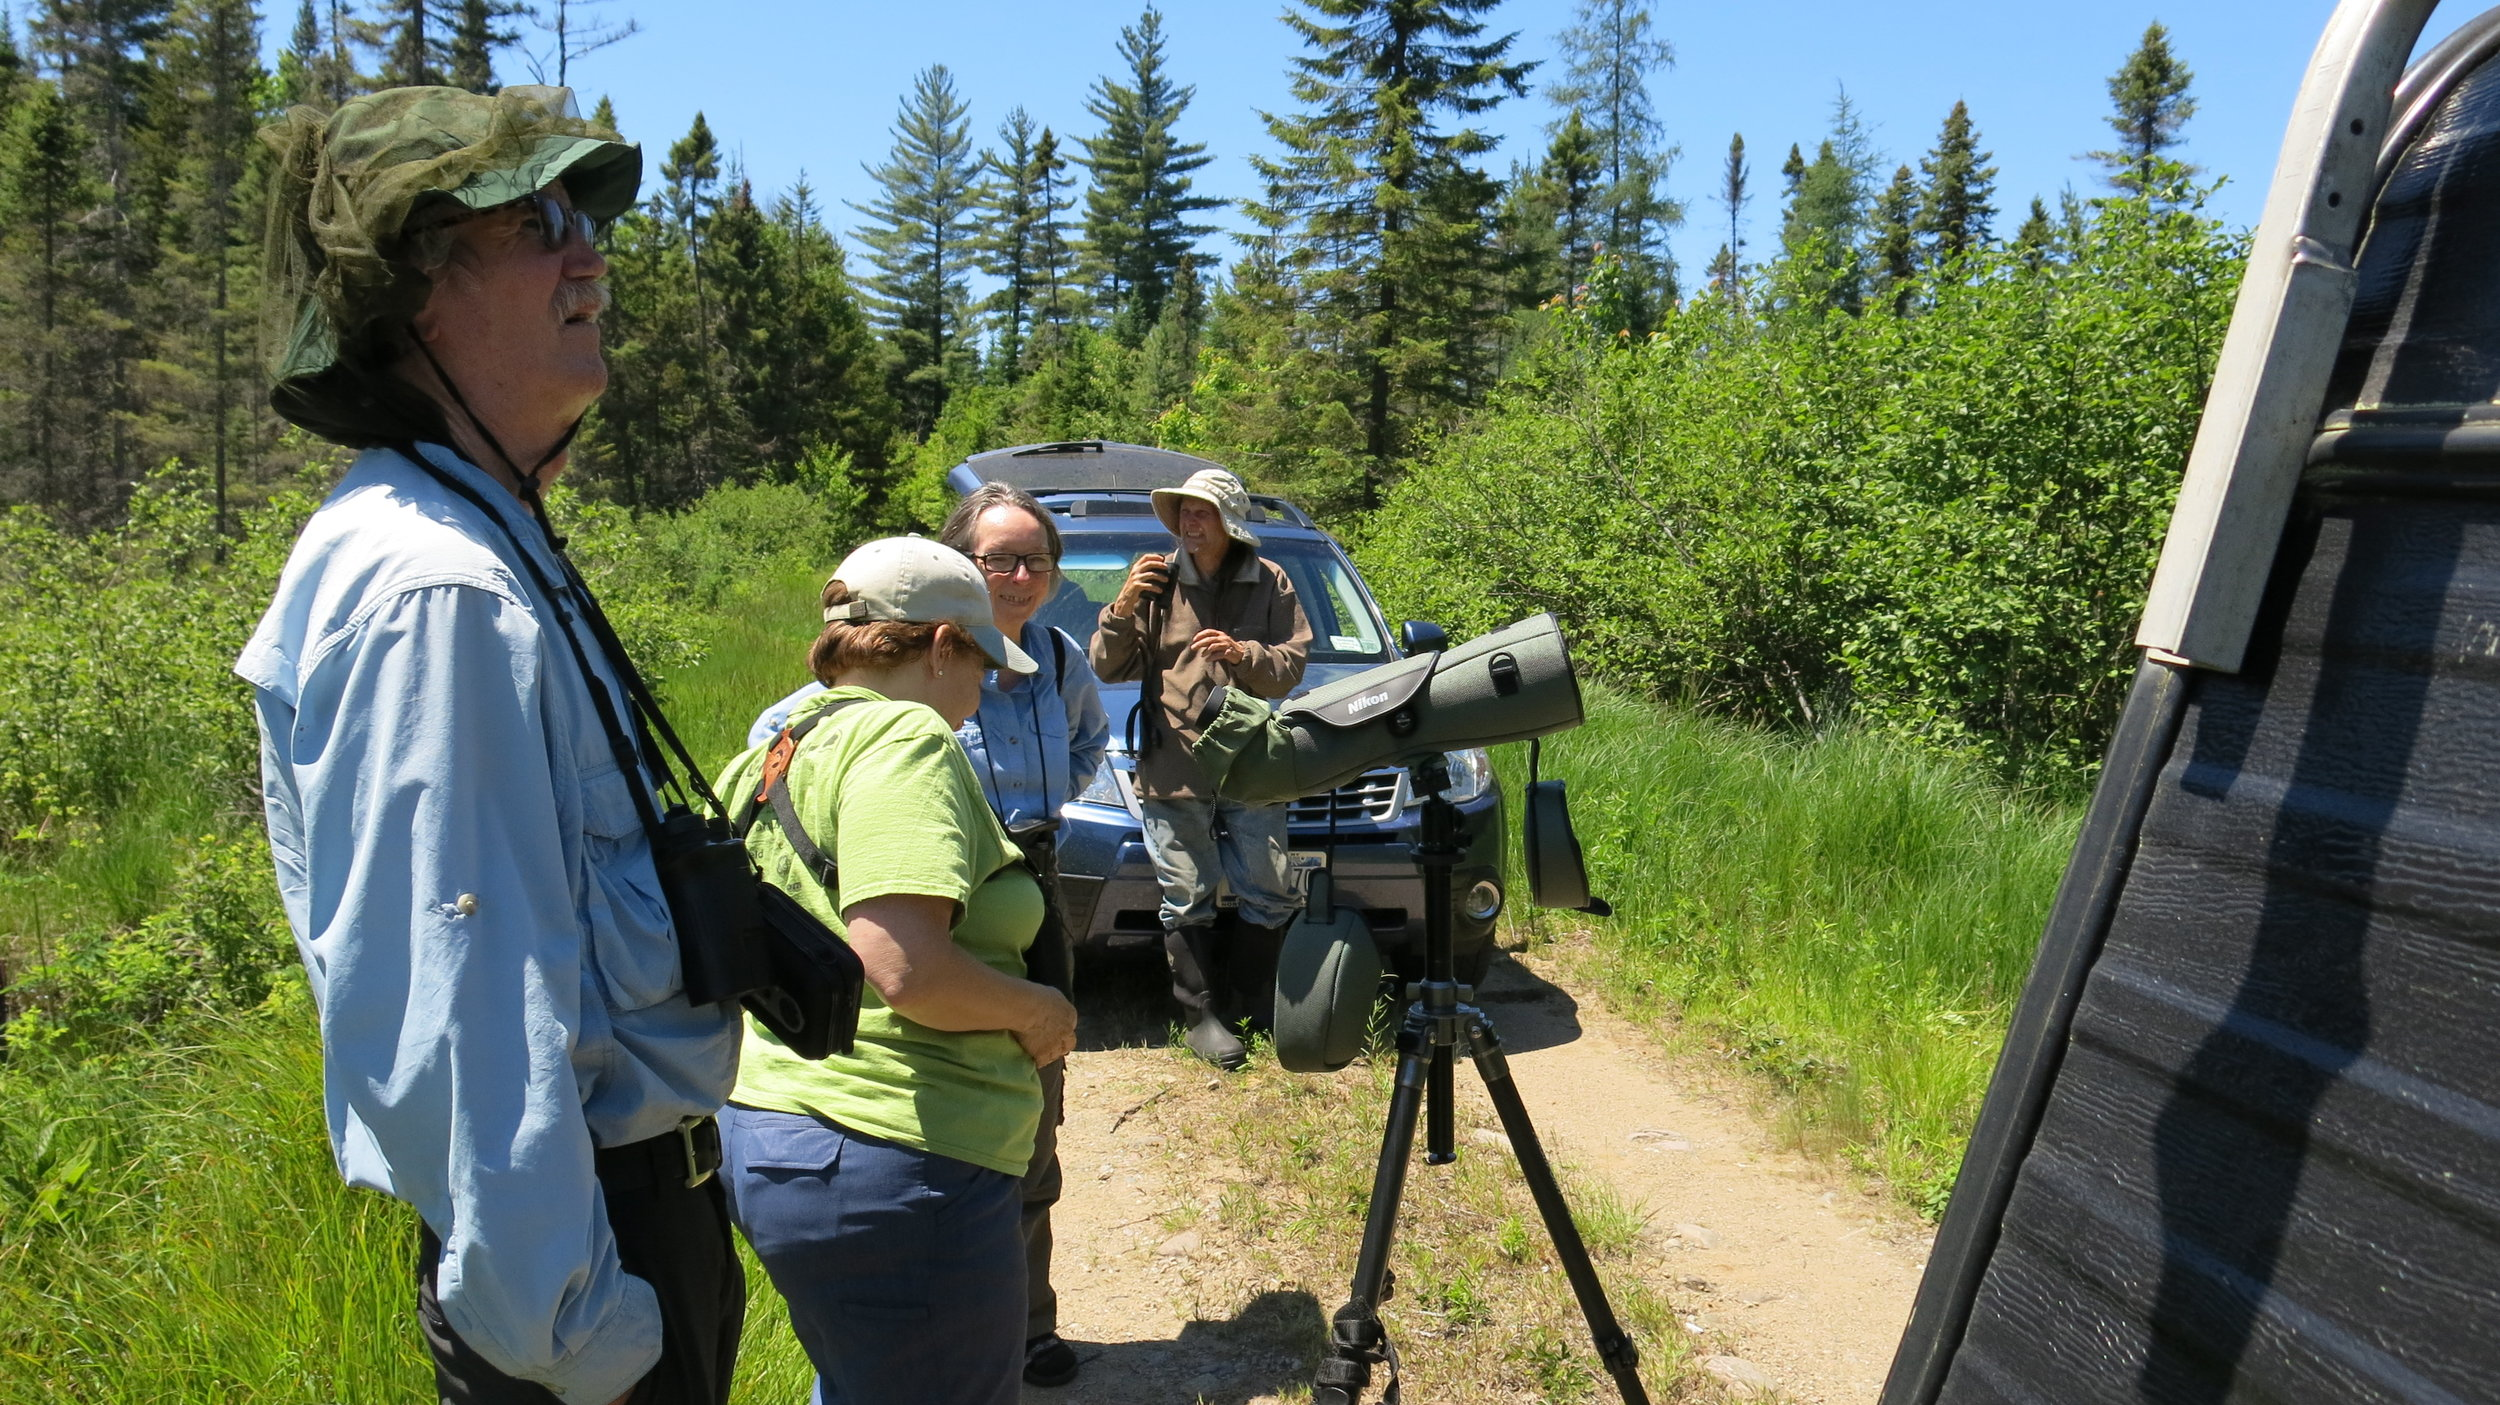 Members of Northern New york audubon visiting during the spring 2014 bird surveys.